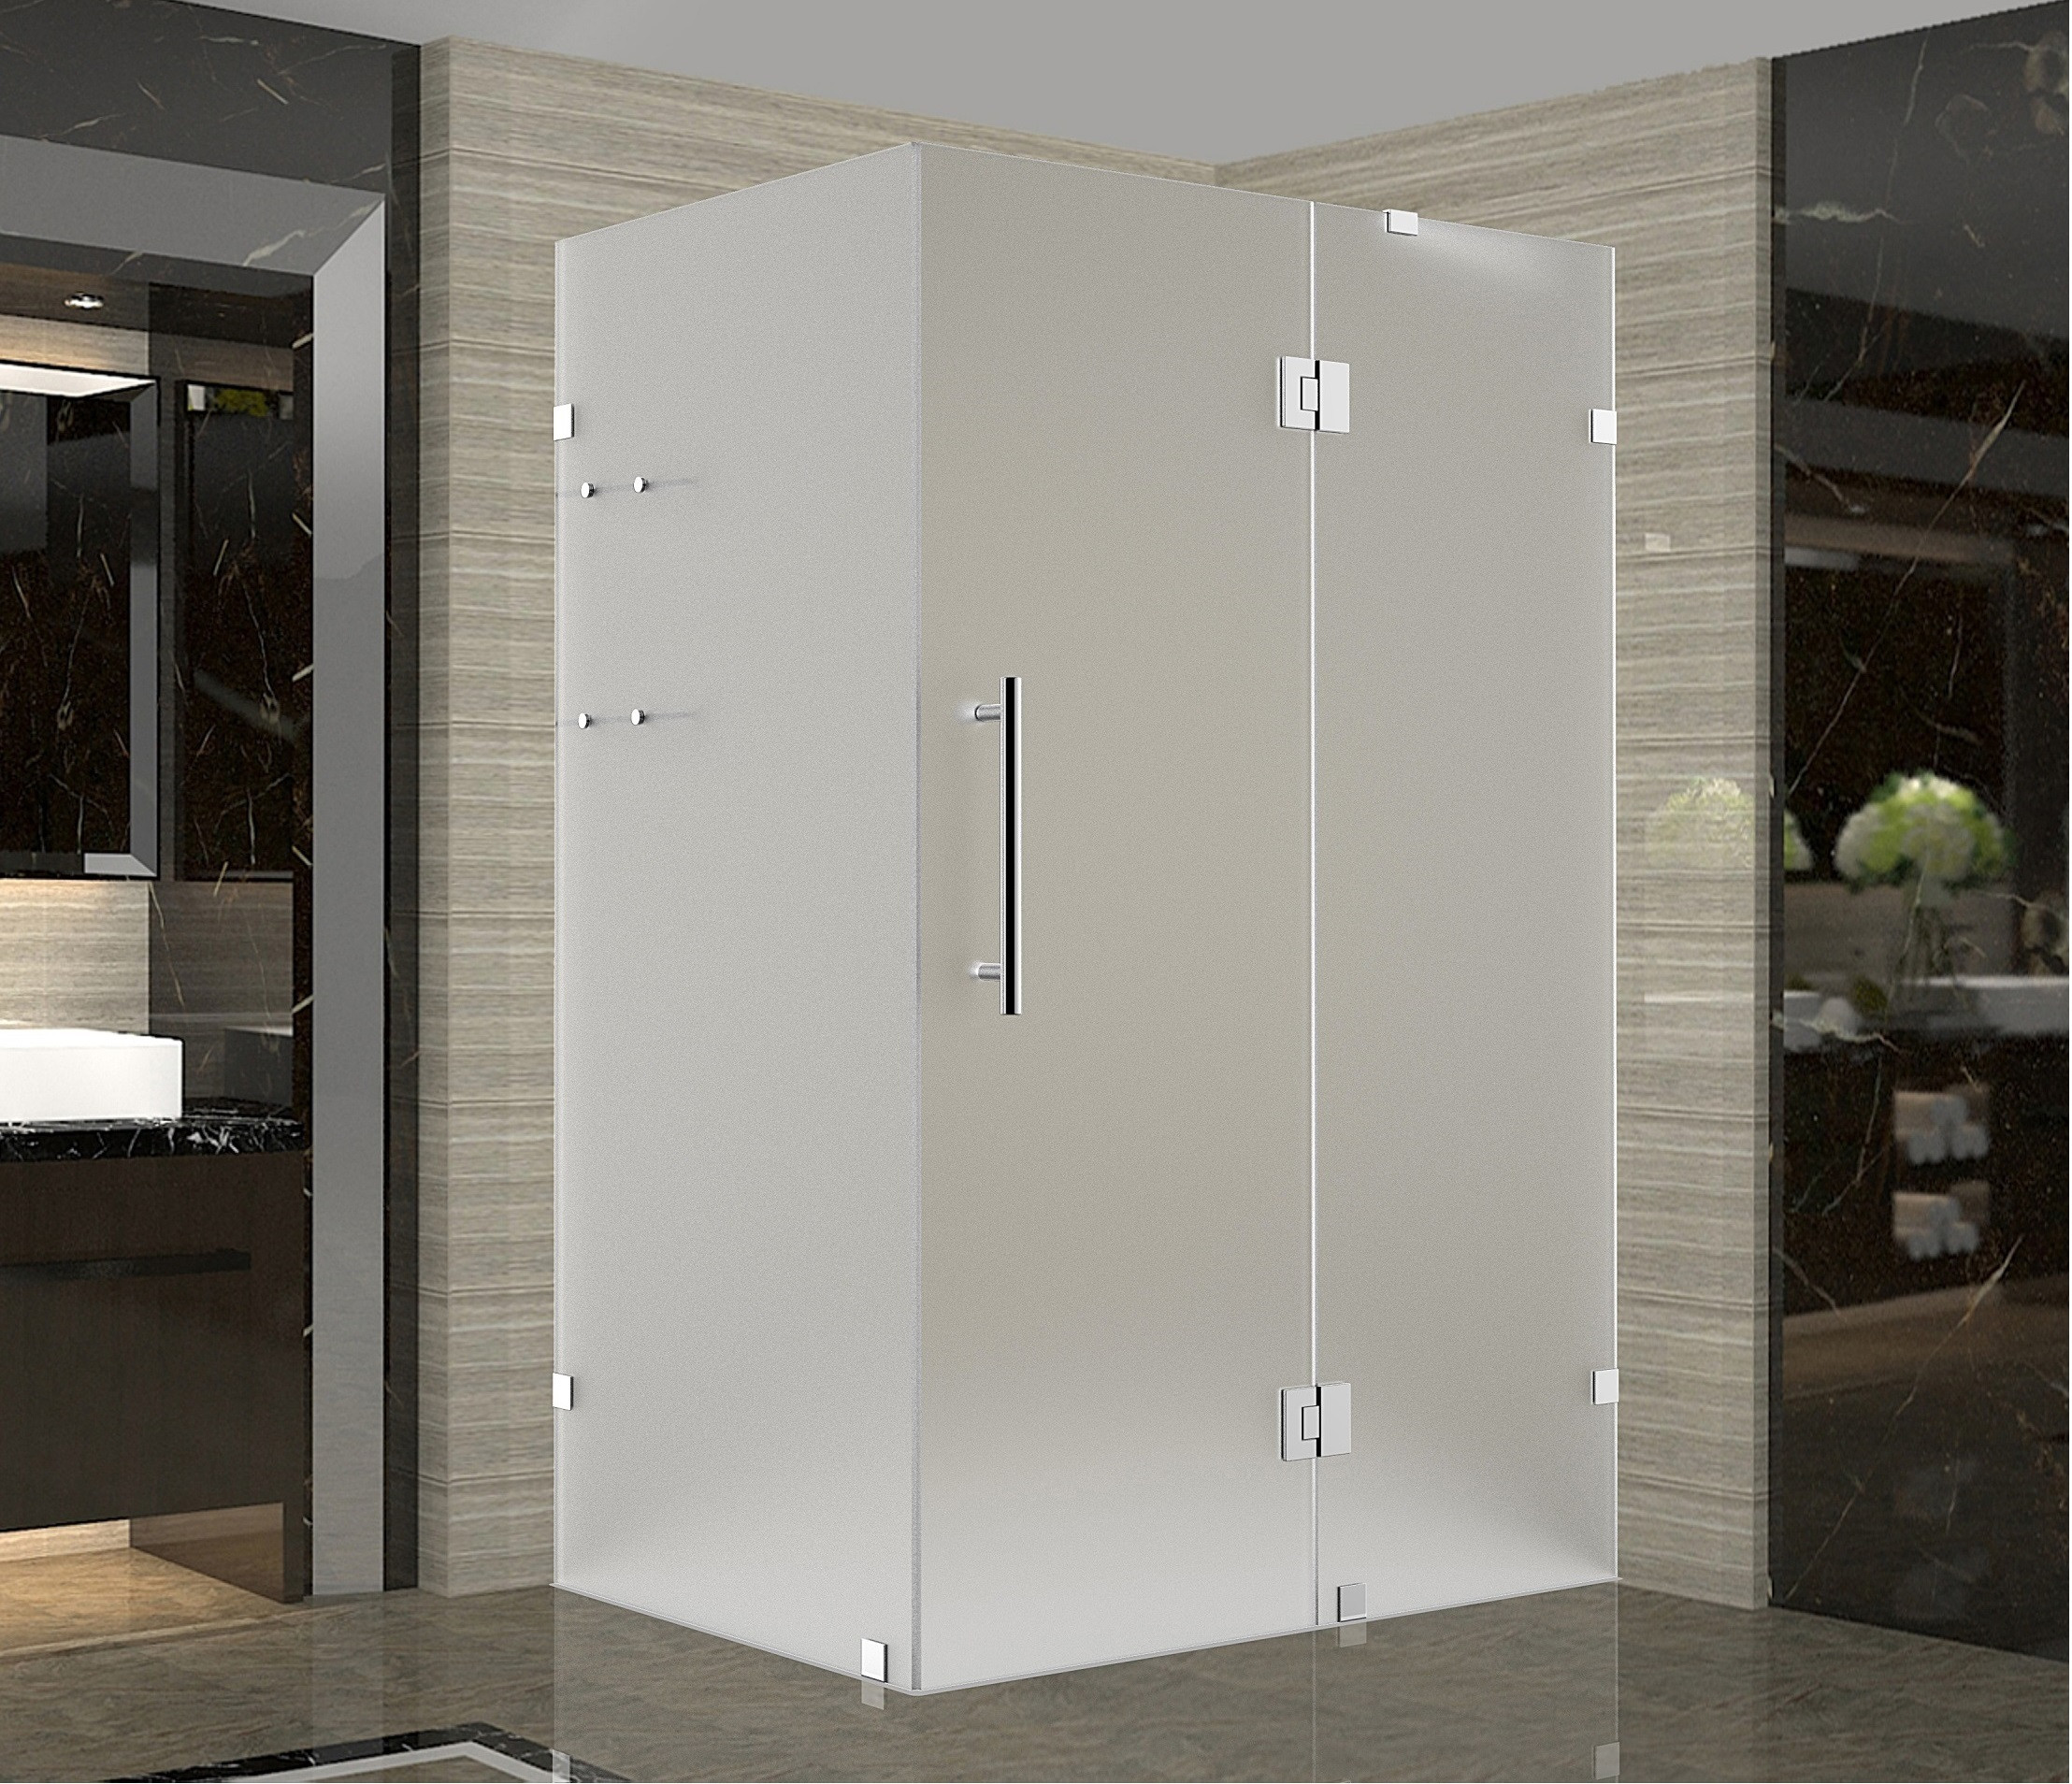 Aston Global SEN992F-SS-3638-10 Stainless Steel Completely Frameless Frosted Glass Shower Enclosure